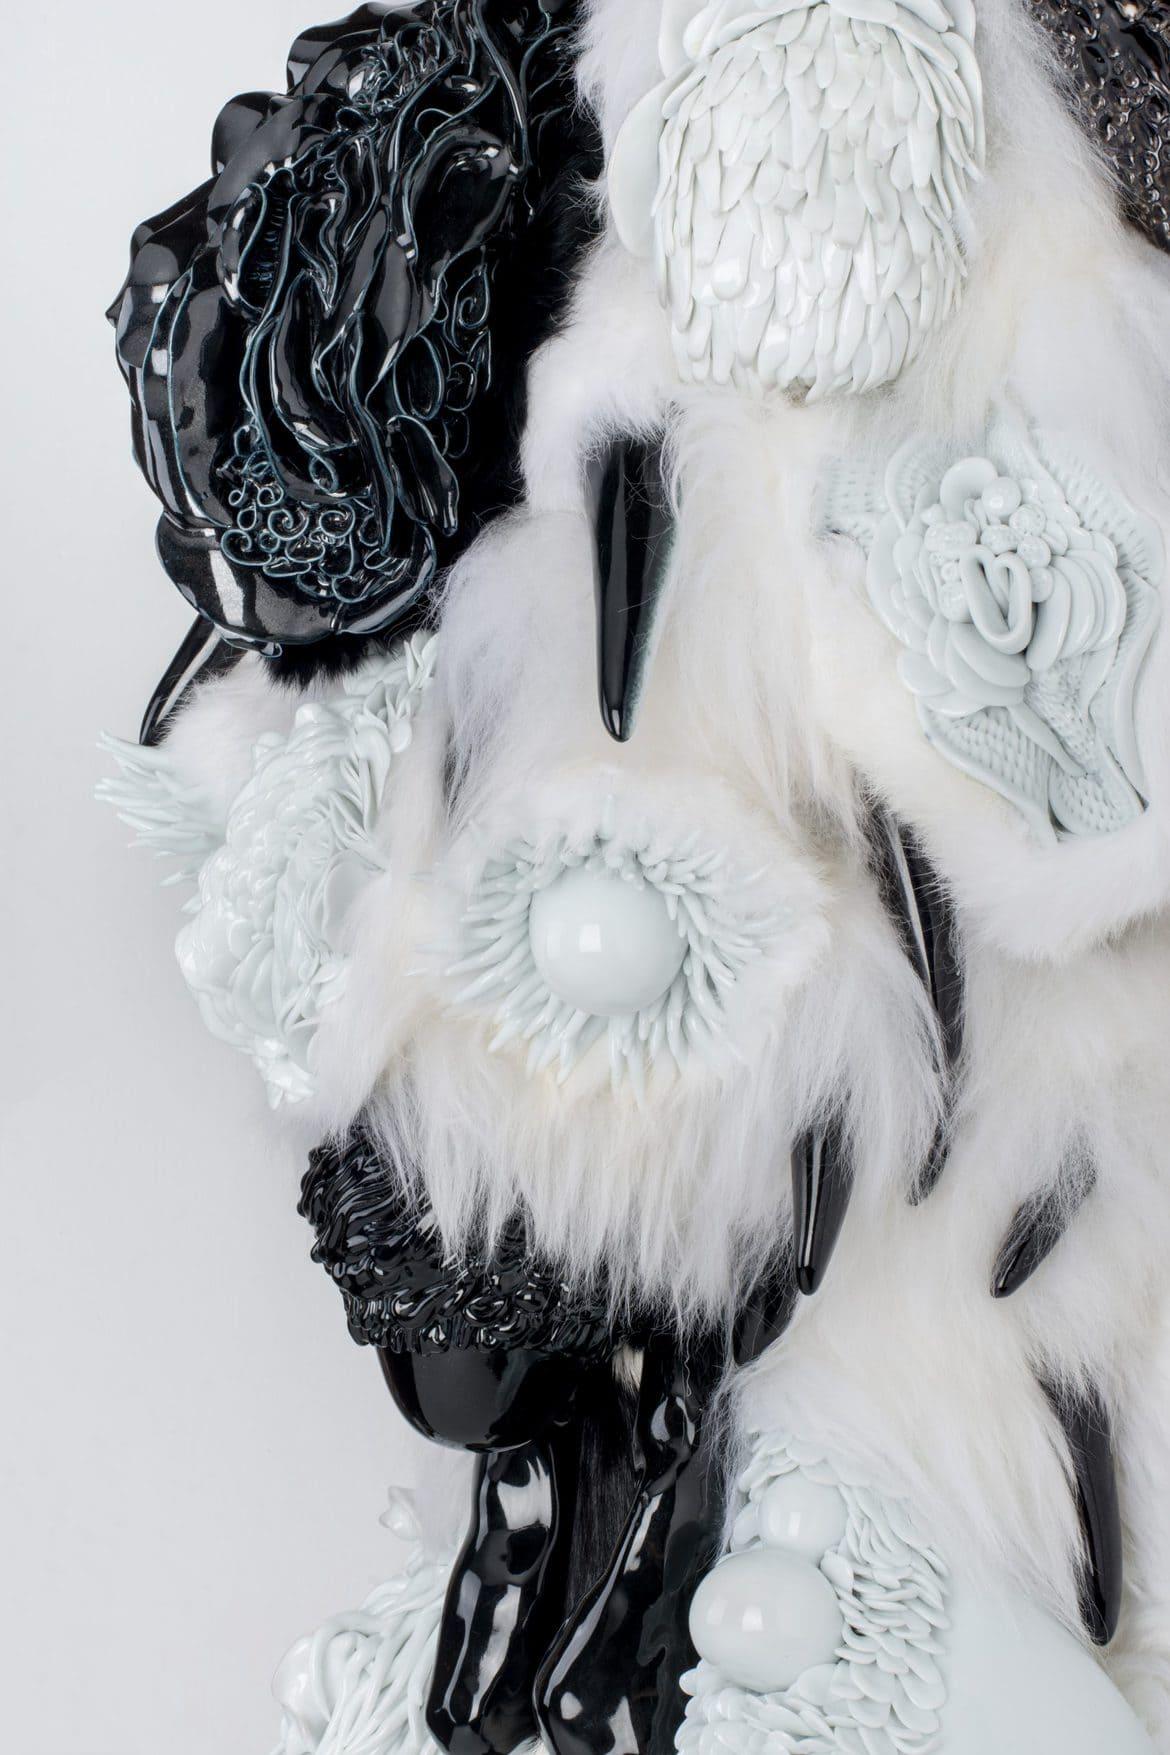 Juz Kitson, 'Something left beside, something left behind, a bit of something left inside', 2017, Jingdezhen porcelain, merino wool, rabbit fur, marine ply and treated pine, 110 x 43 x 27 cm